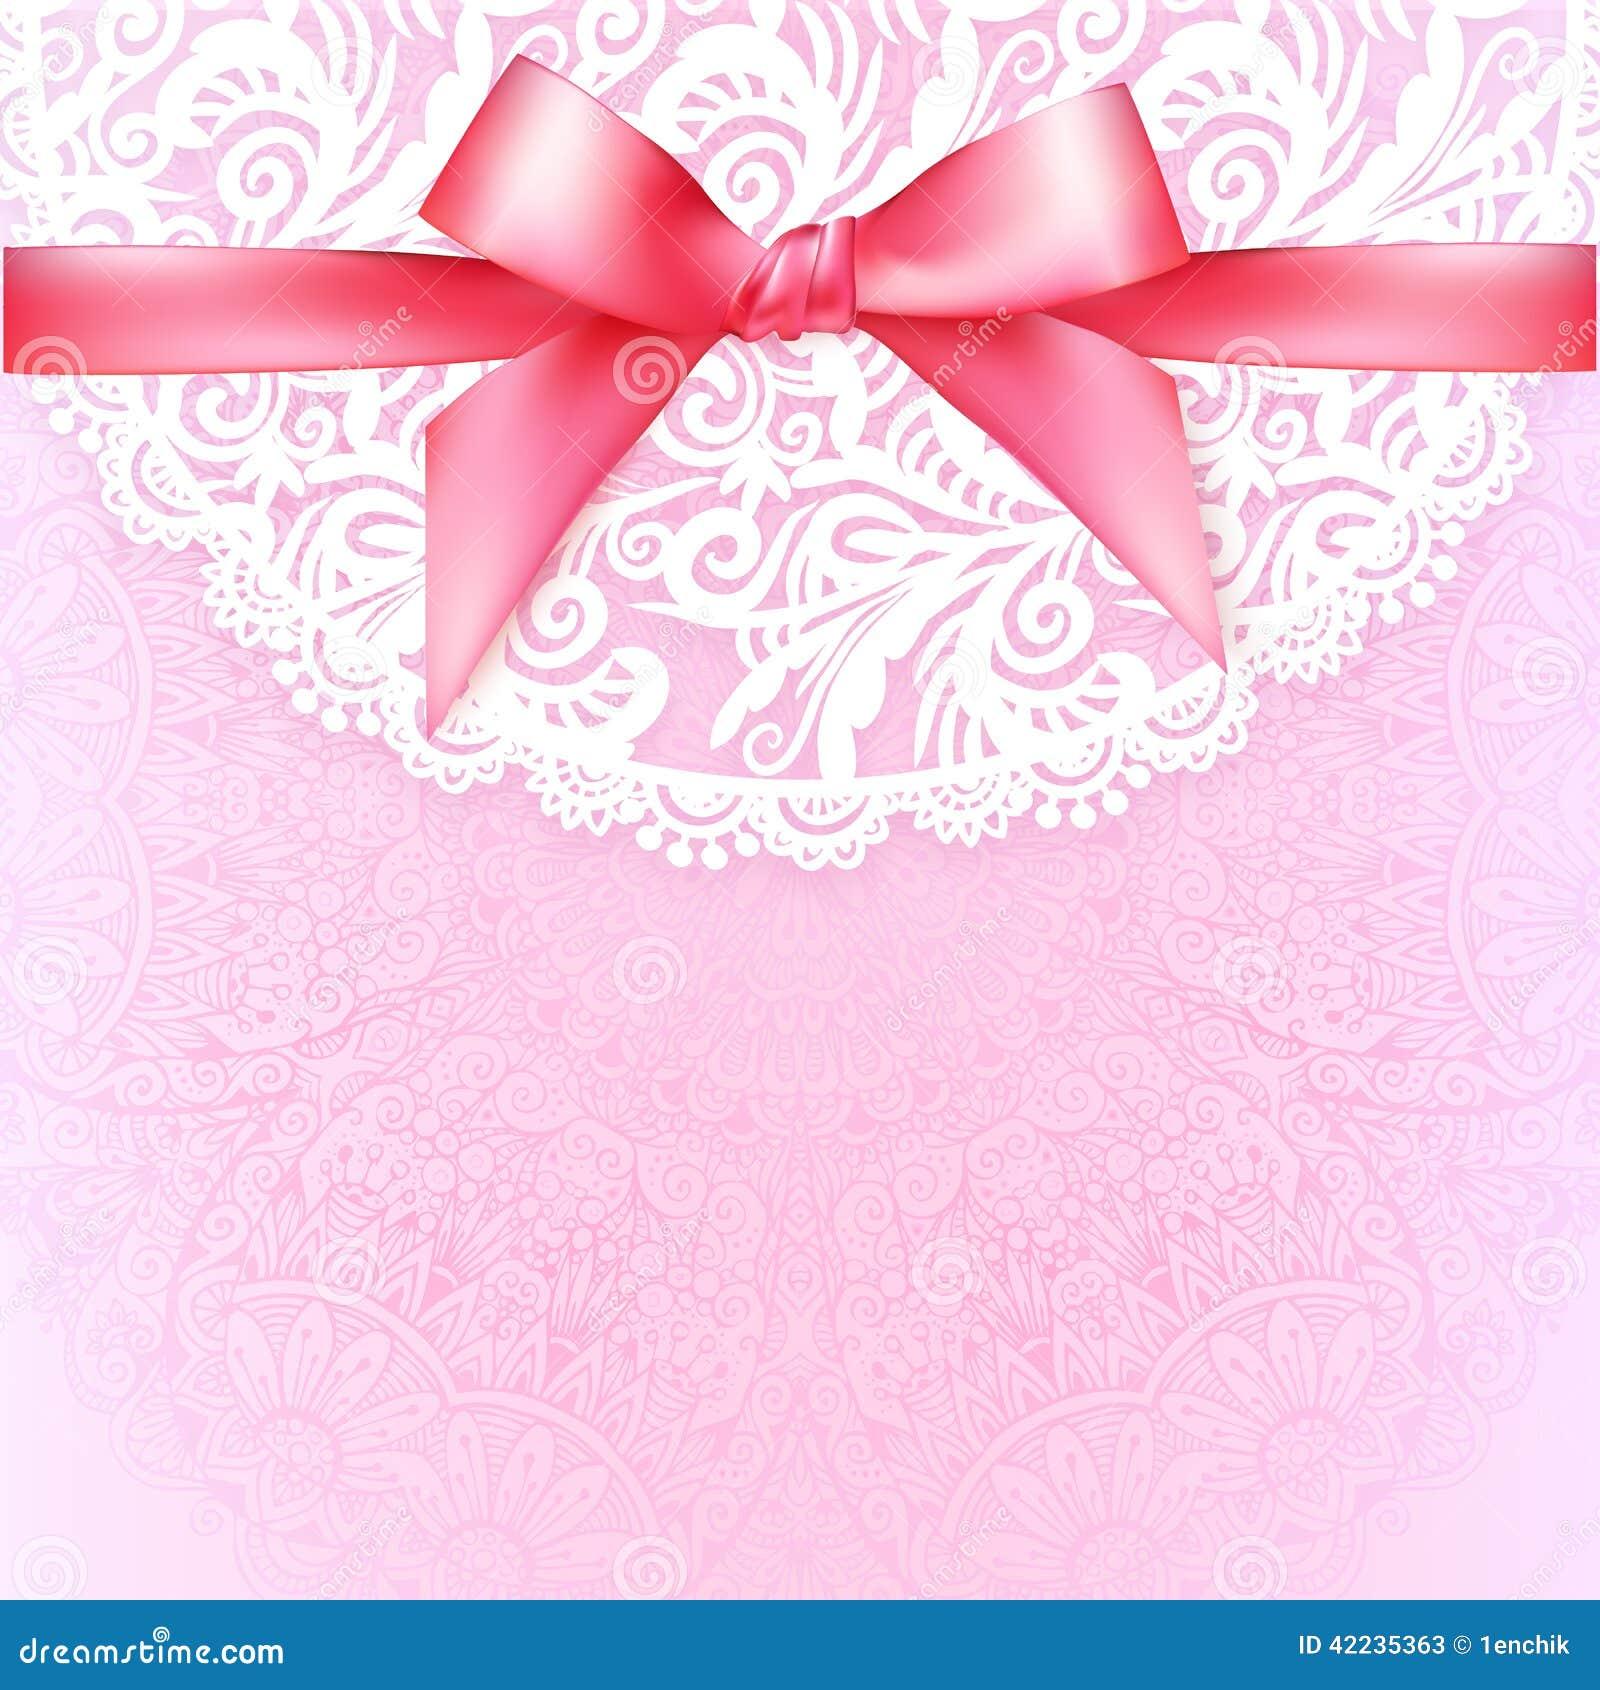 Message In Wedding Invitation for perfect invitation template